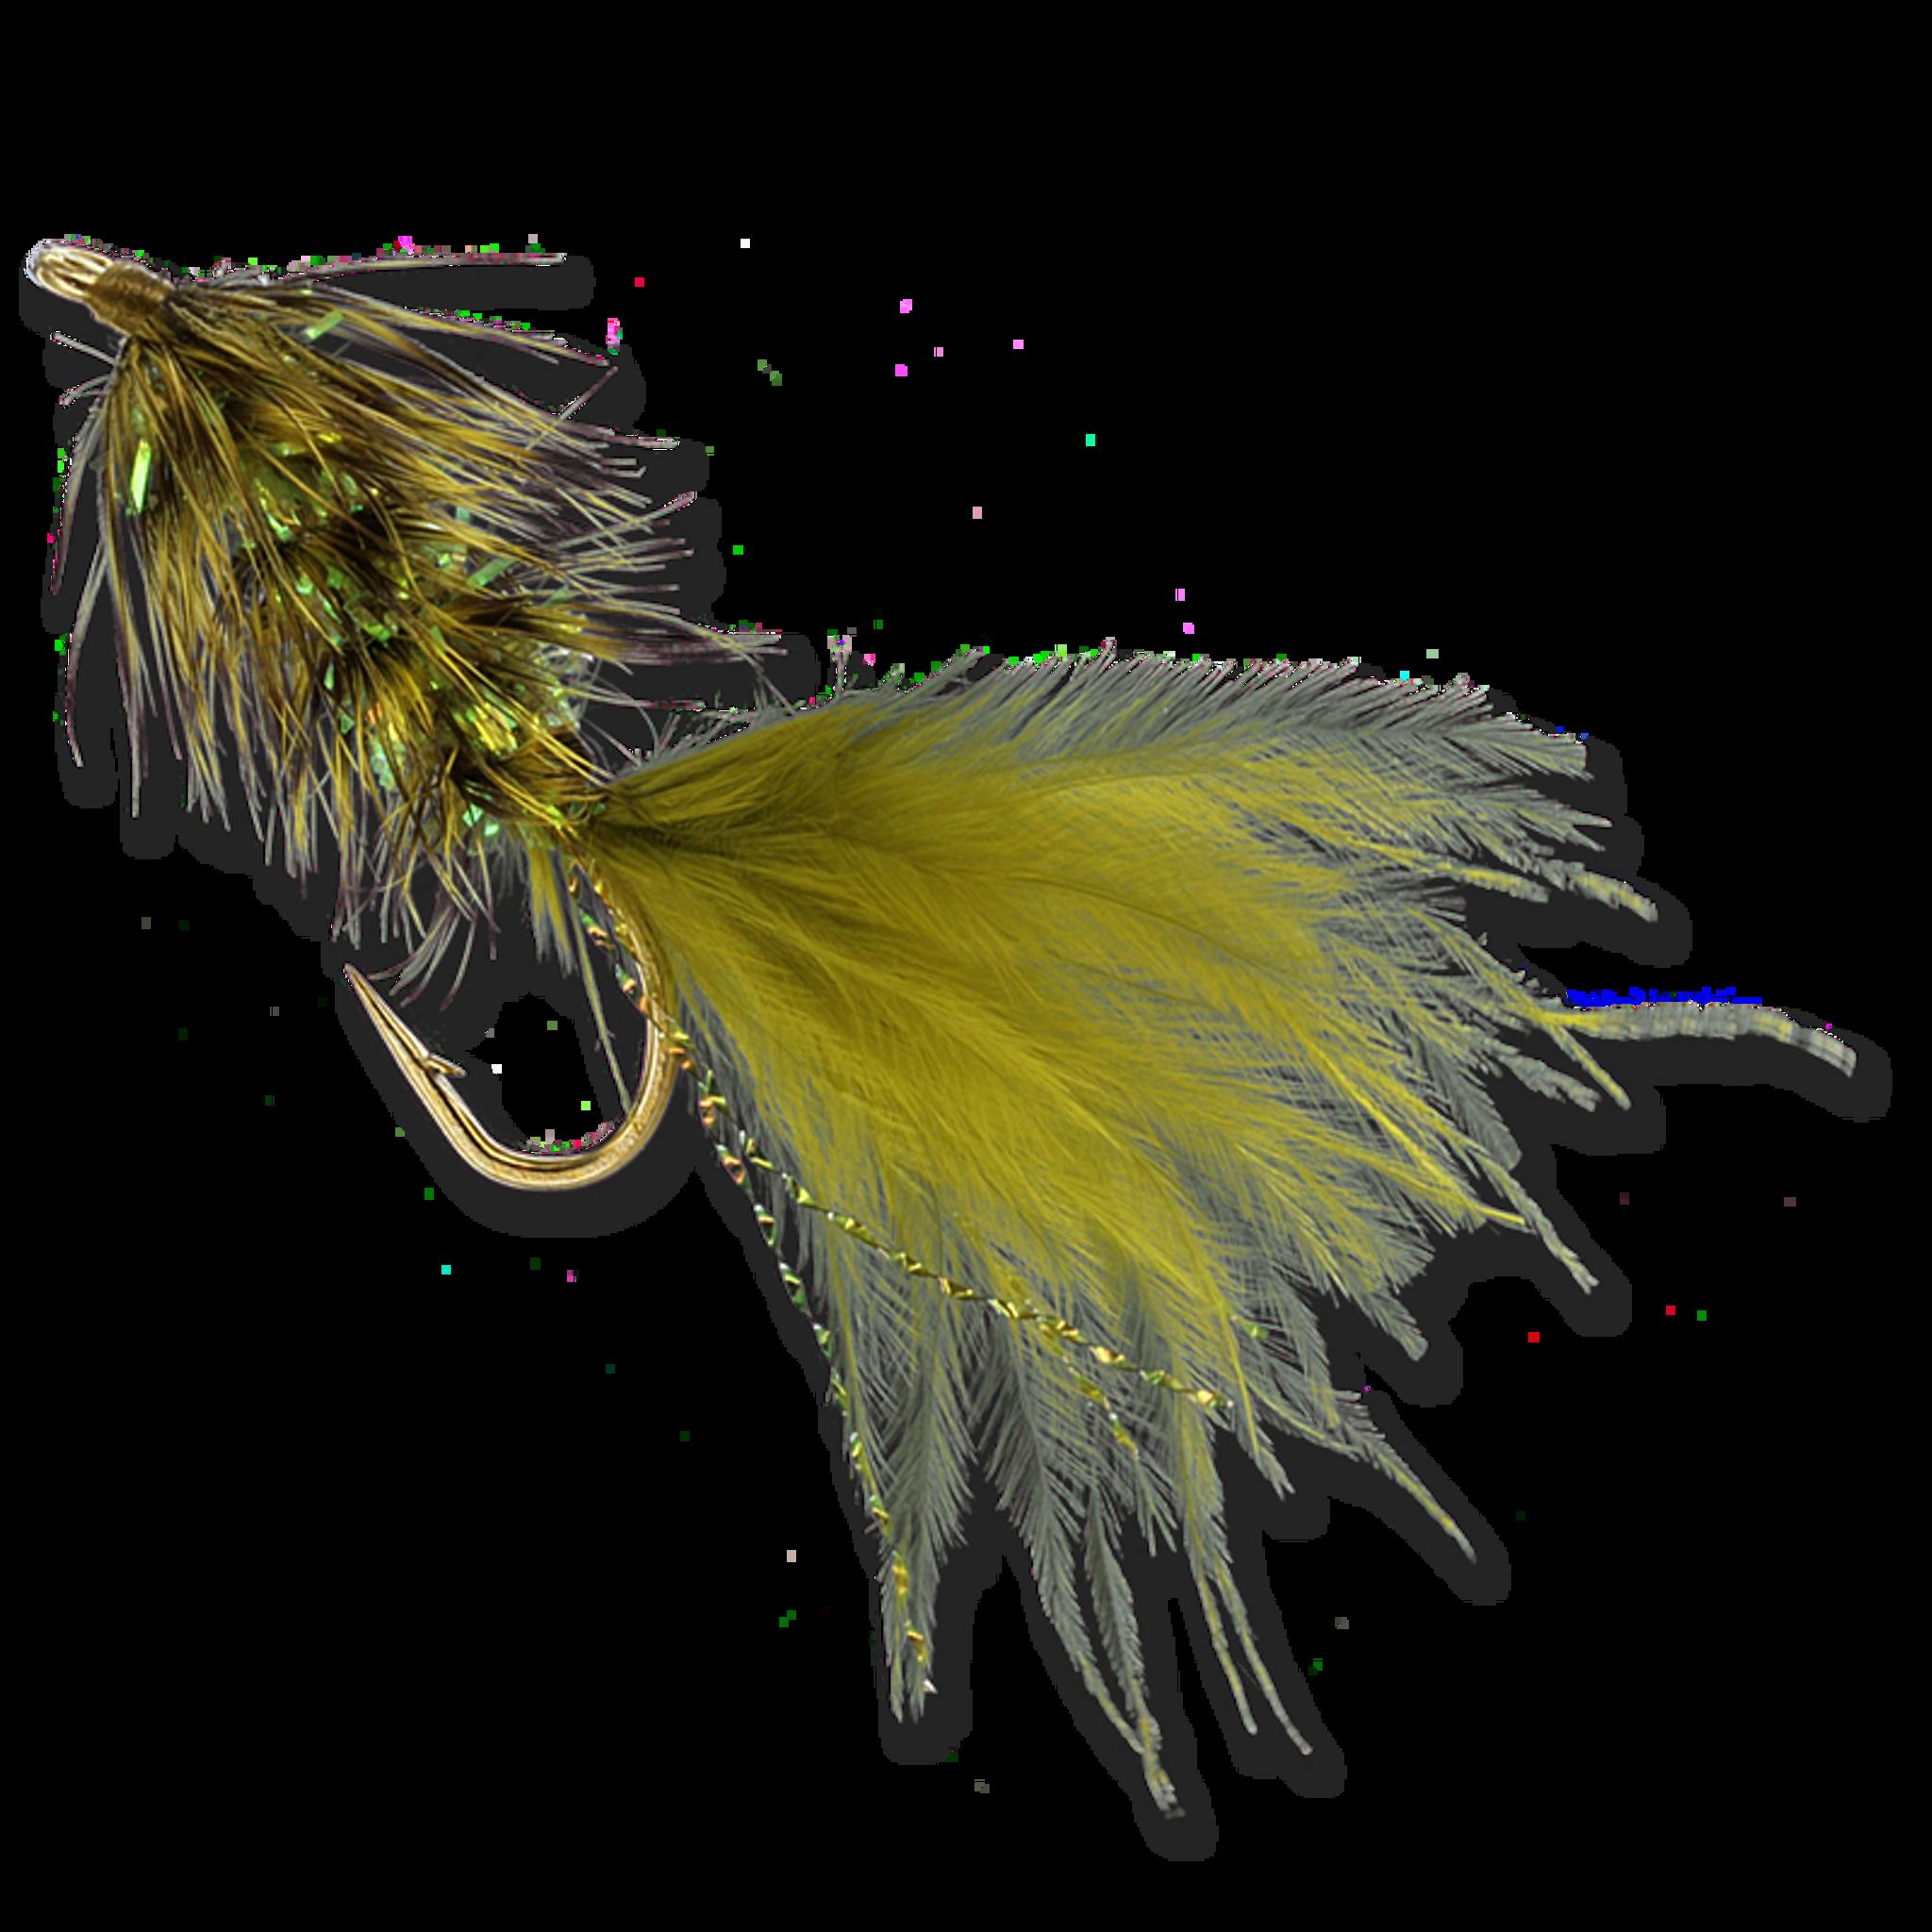 Tinsel Chenille Crystal Fly Tying Yarn Bonefish Streamer Fly Tying Material gb